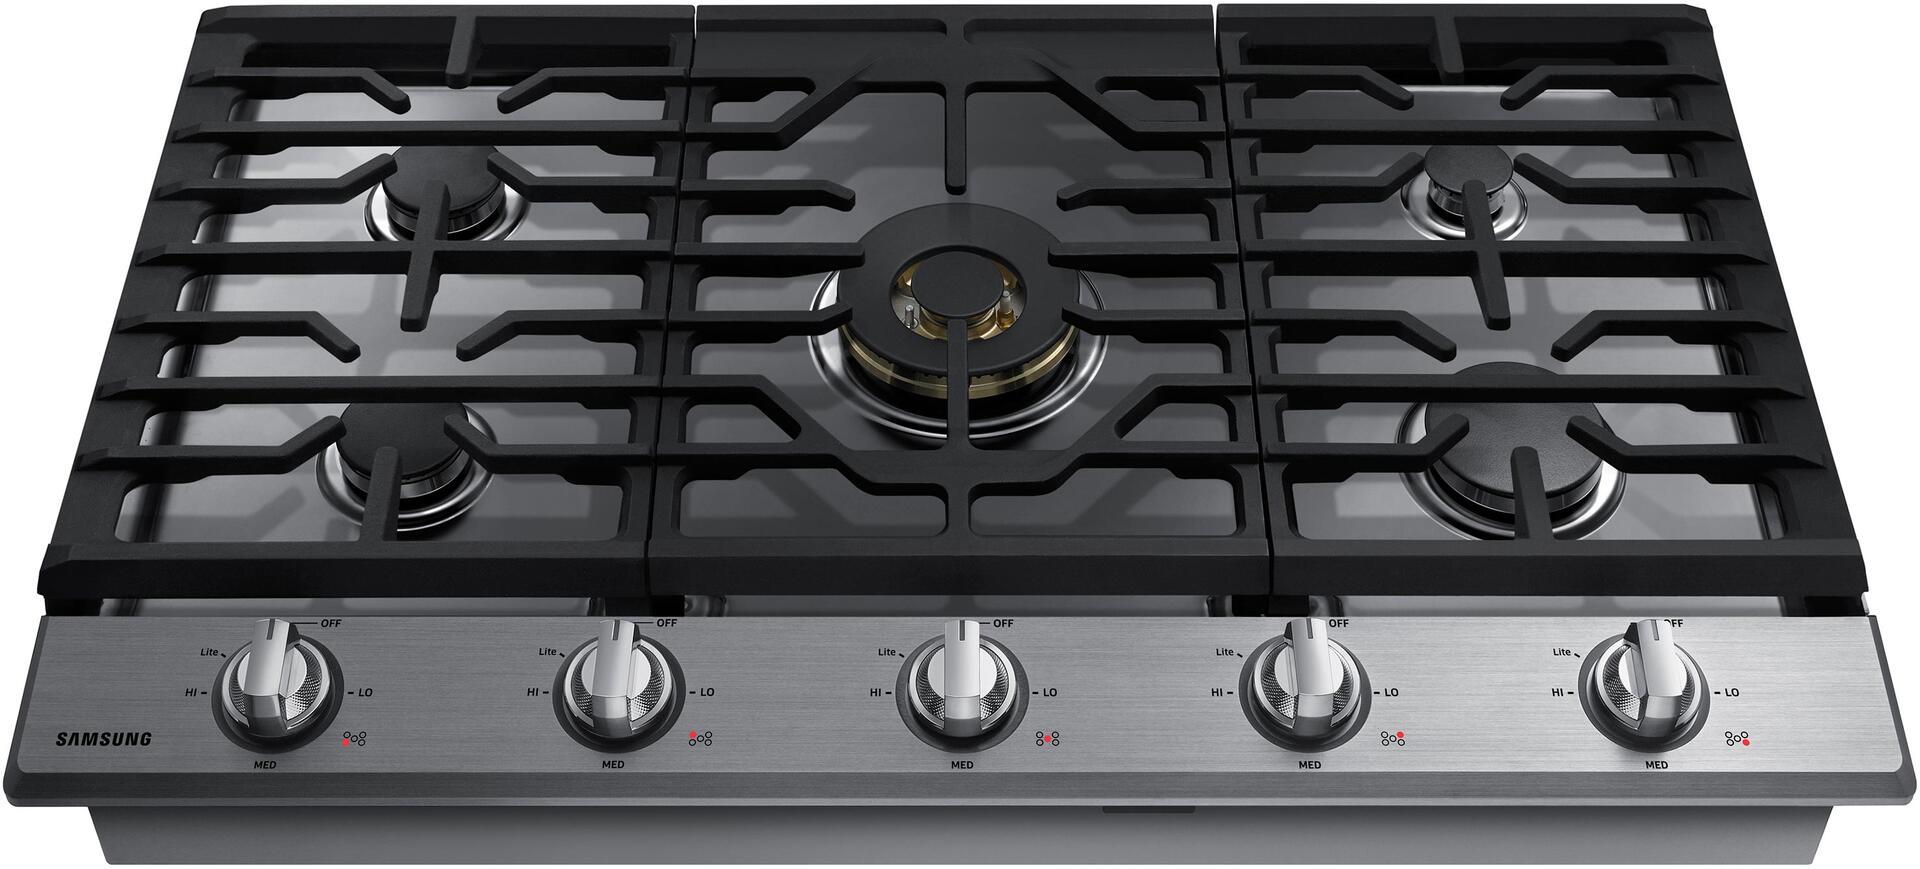 samsung na36k7750ts 36 inch gas sealed burner style cooktop in stainless steel appliances. Black Bedroom Furniture Sets. Home Design Ideas